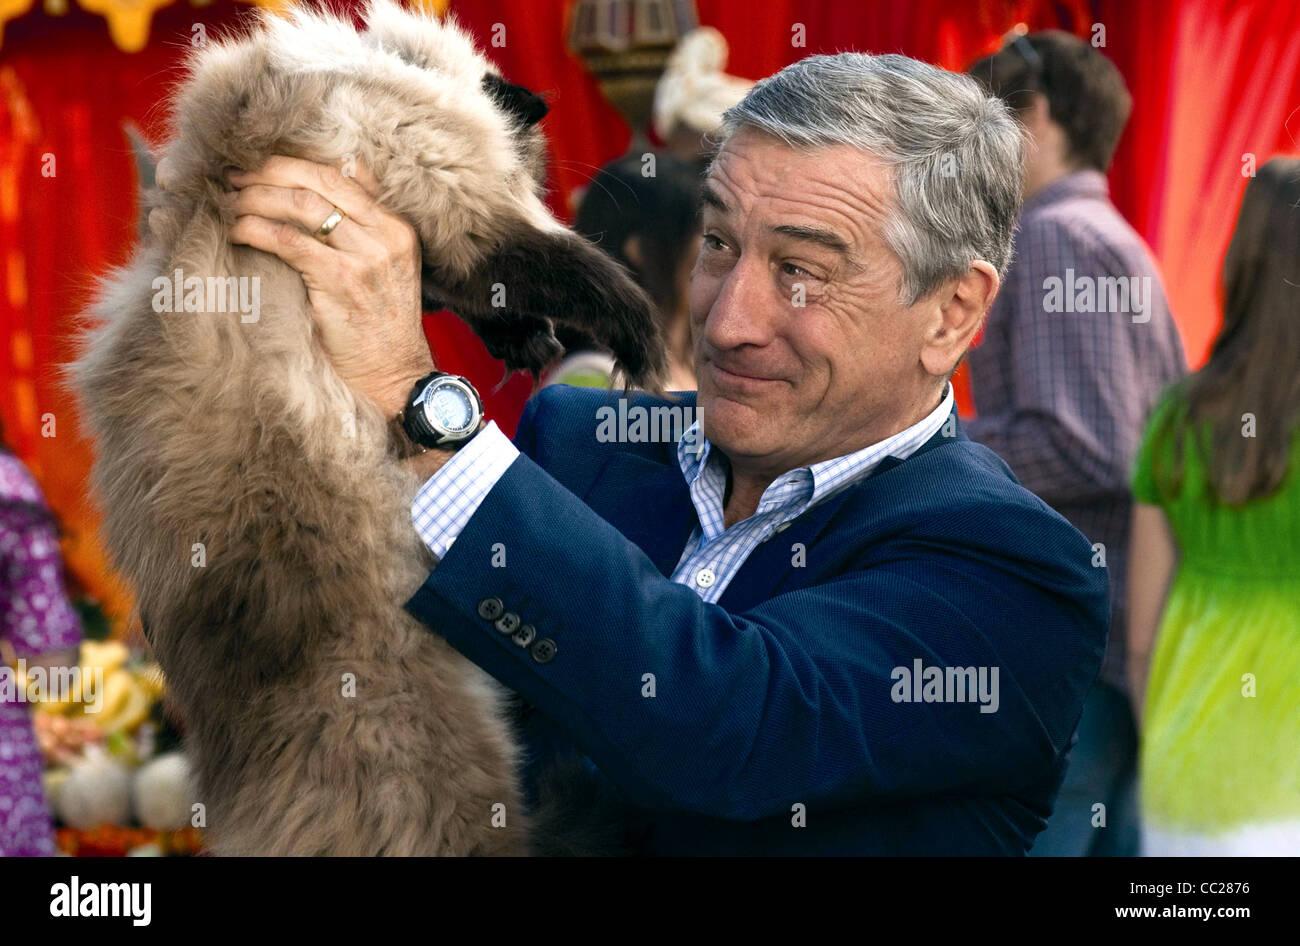 Robert De Niro Little Fockers 2010 Stock Photo Alamy